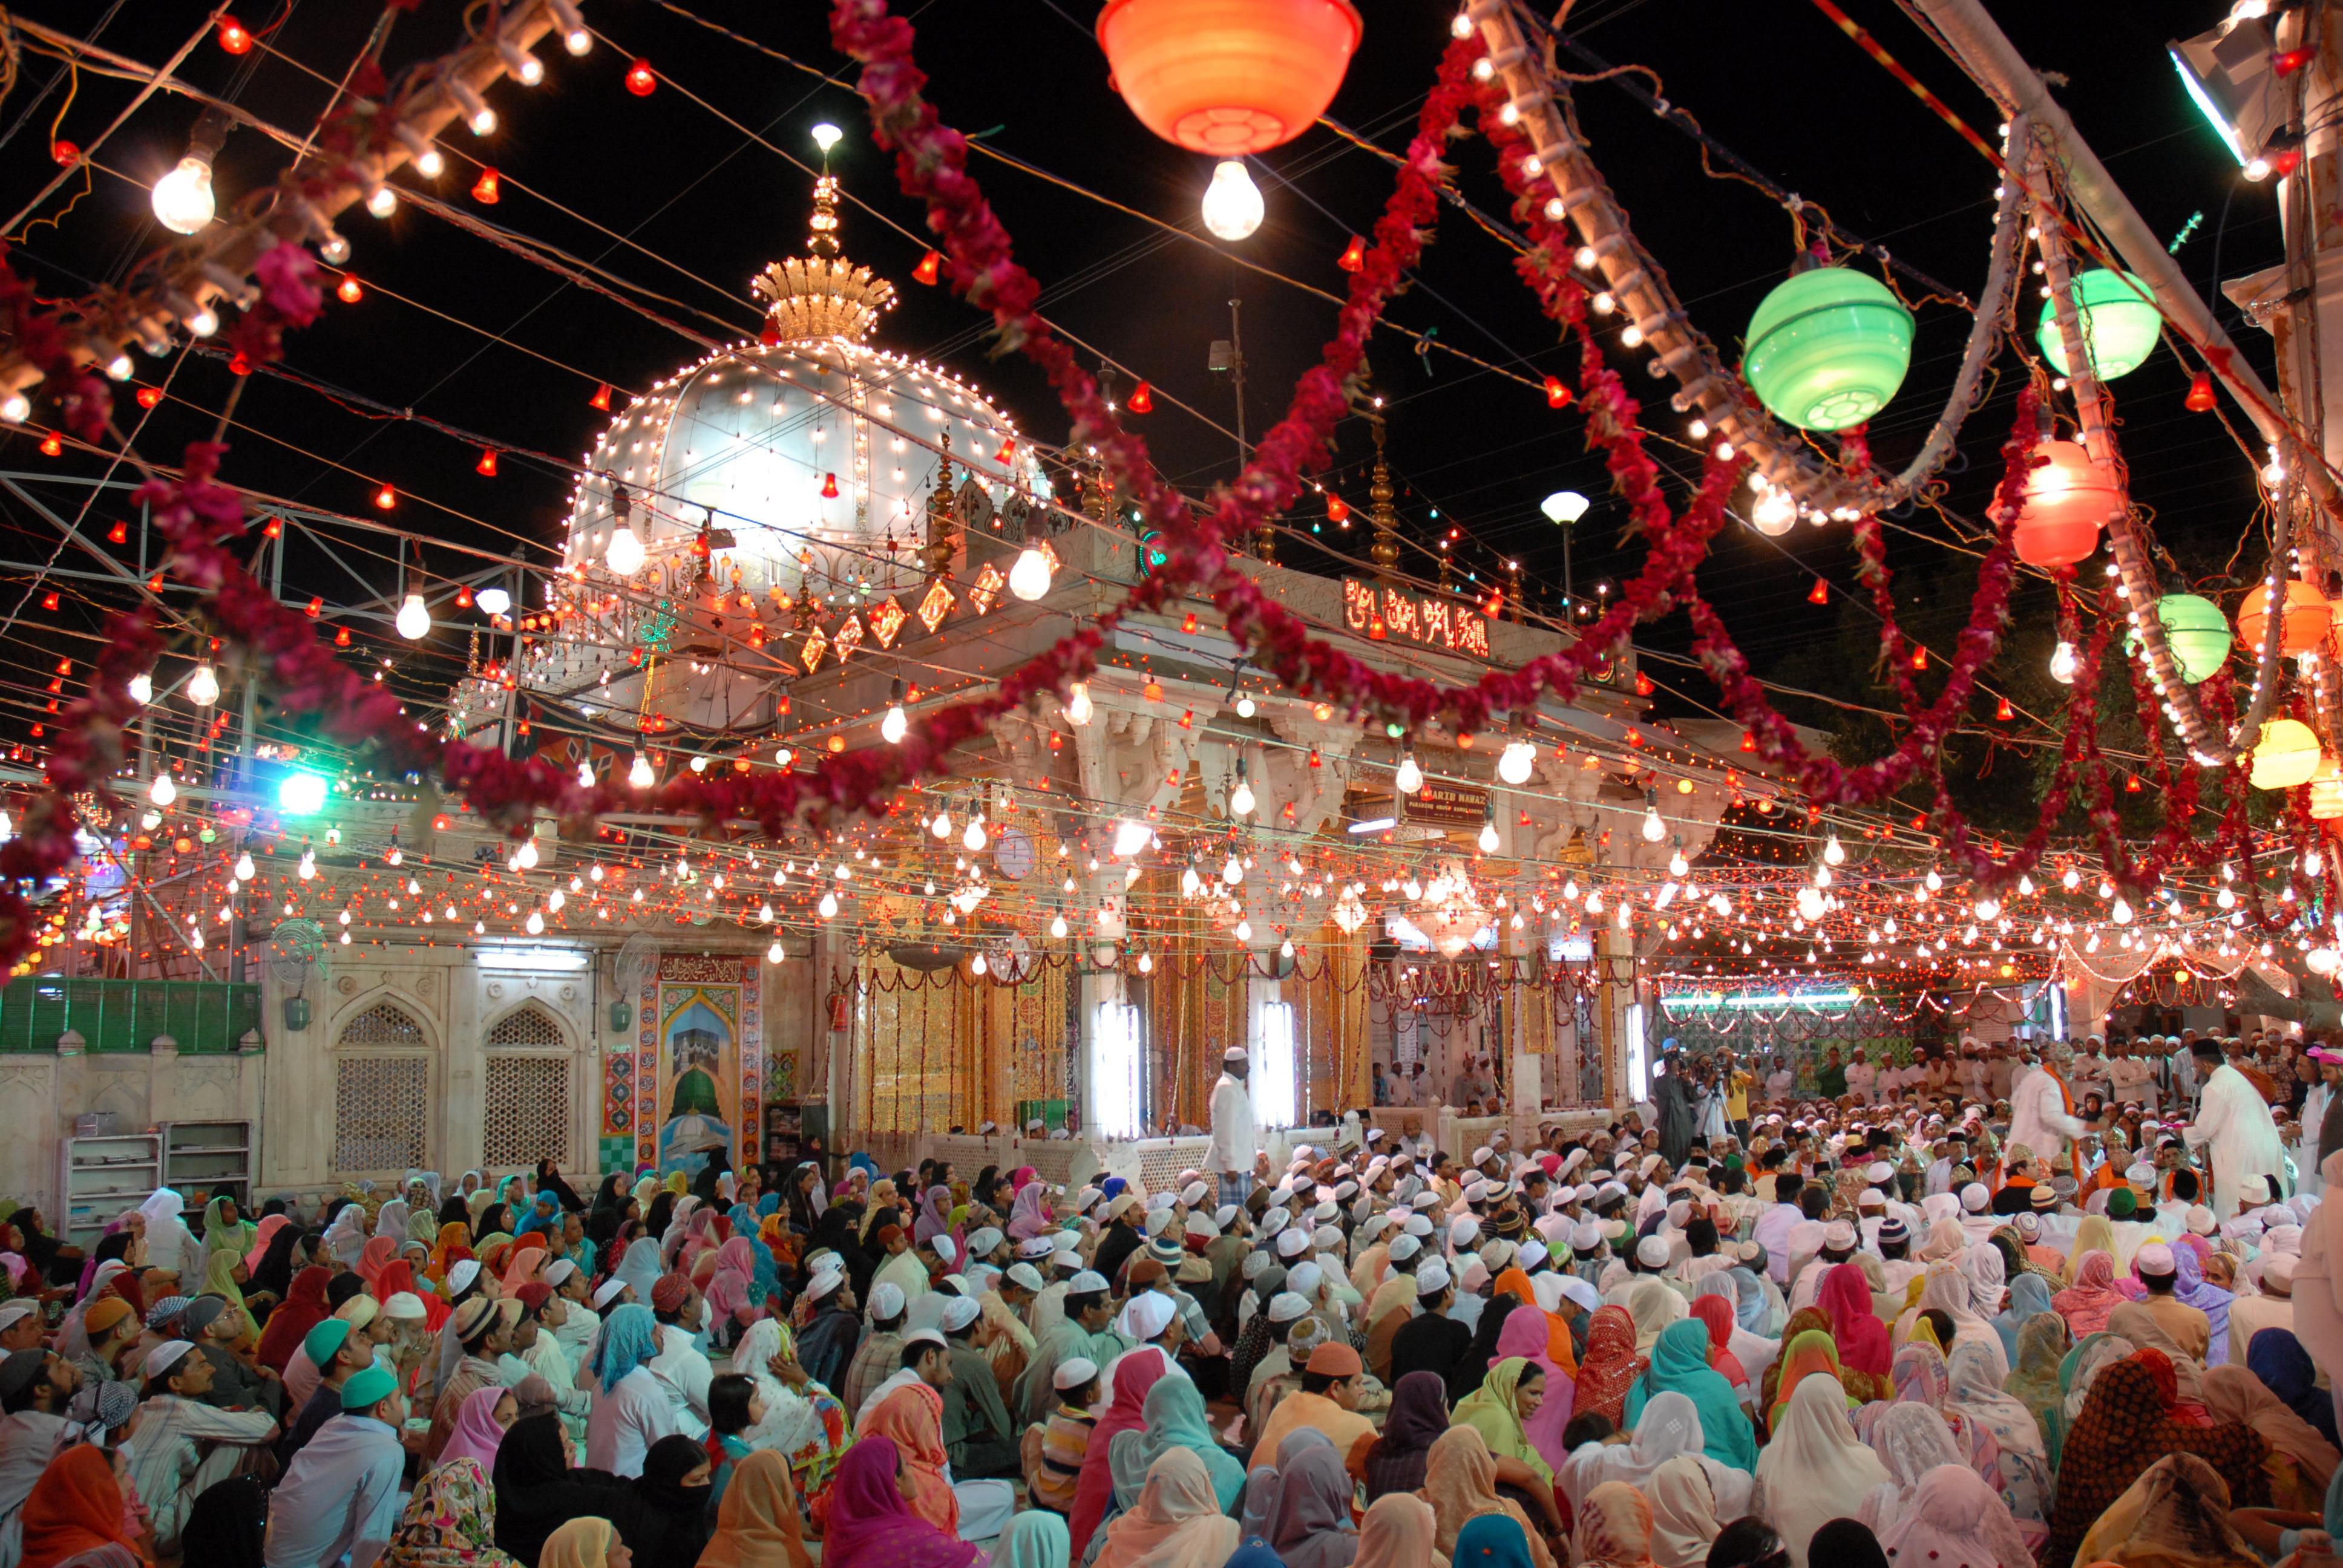 Rajasthan ajmer sharif dargah example of unity